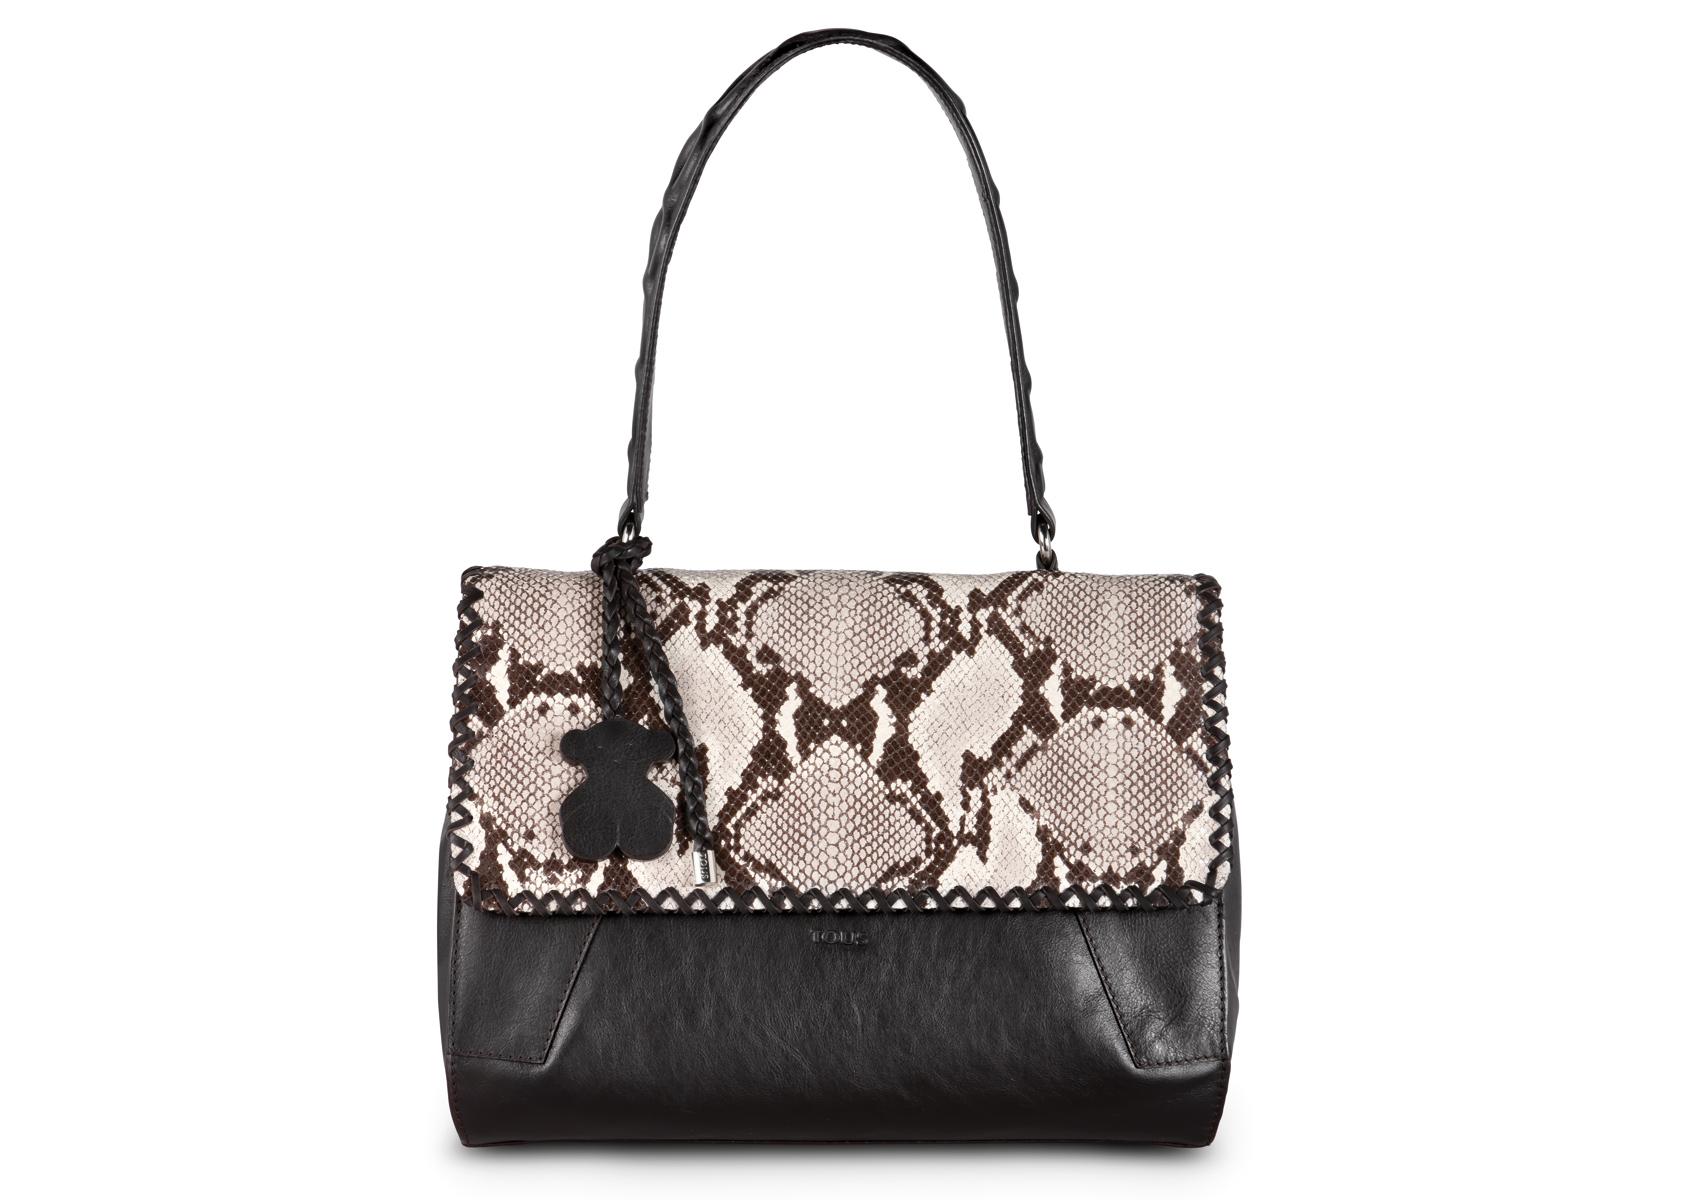 6. Коллекция Bags